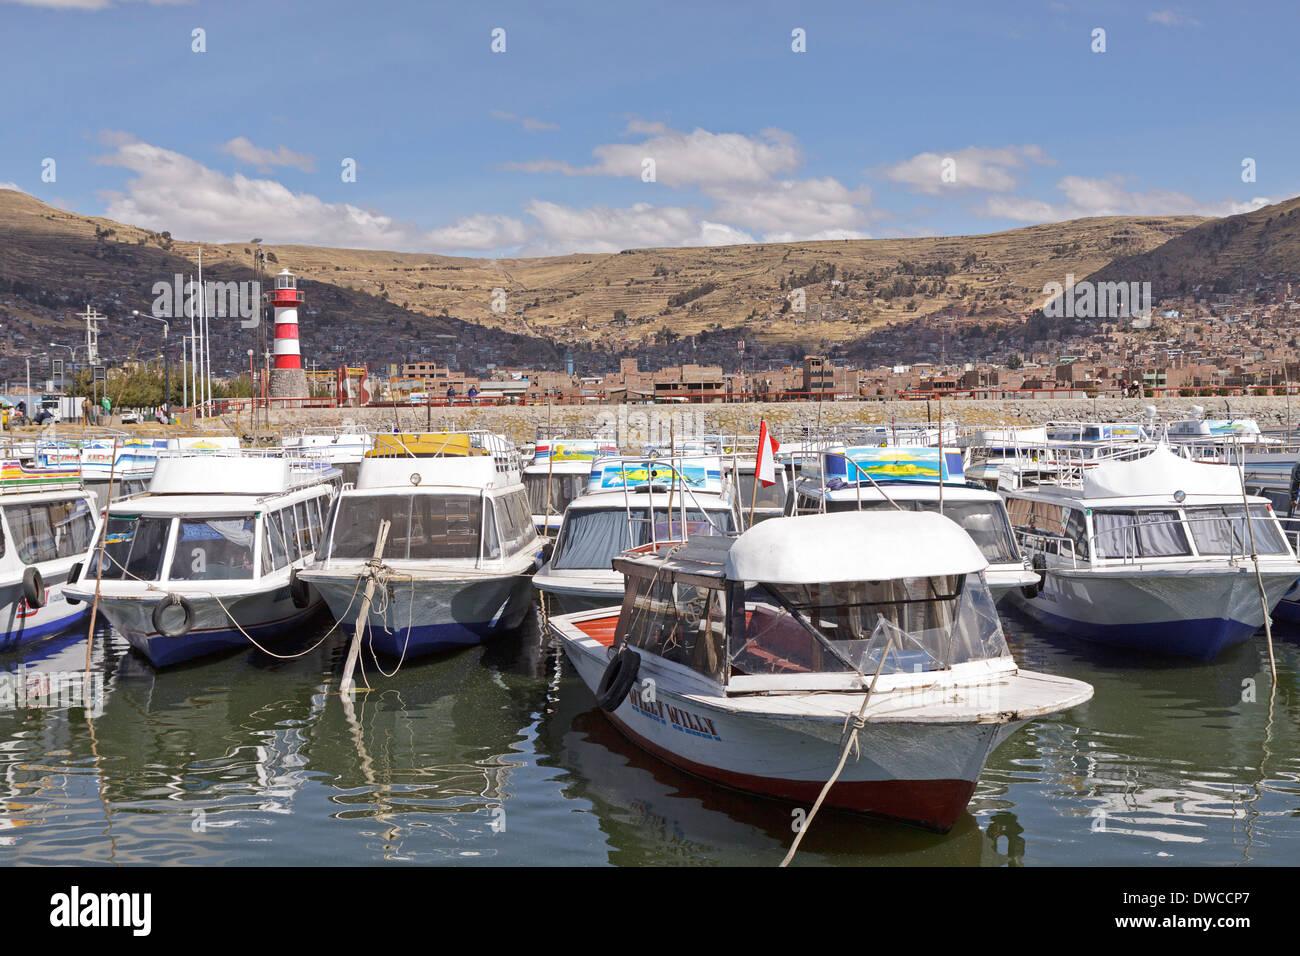 marina of Puno, Peru, South America - Stock Image